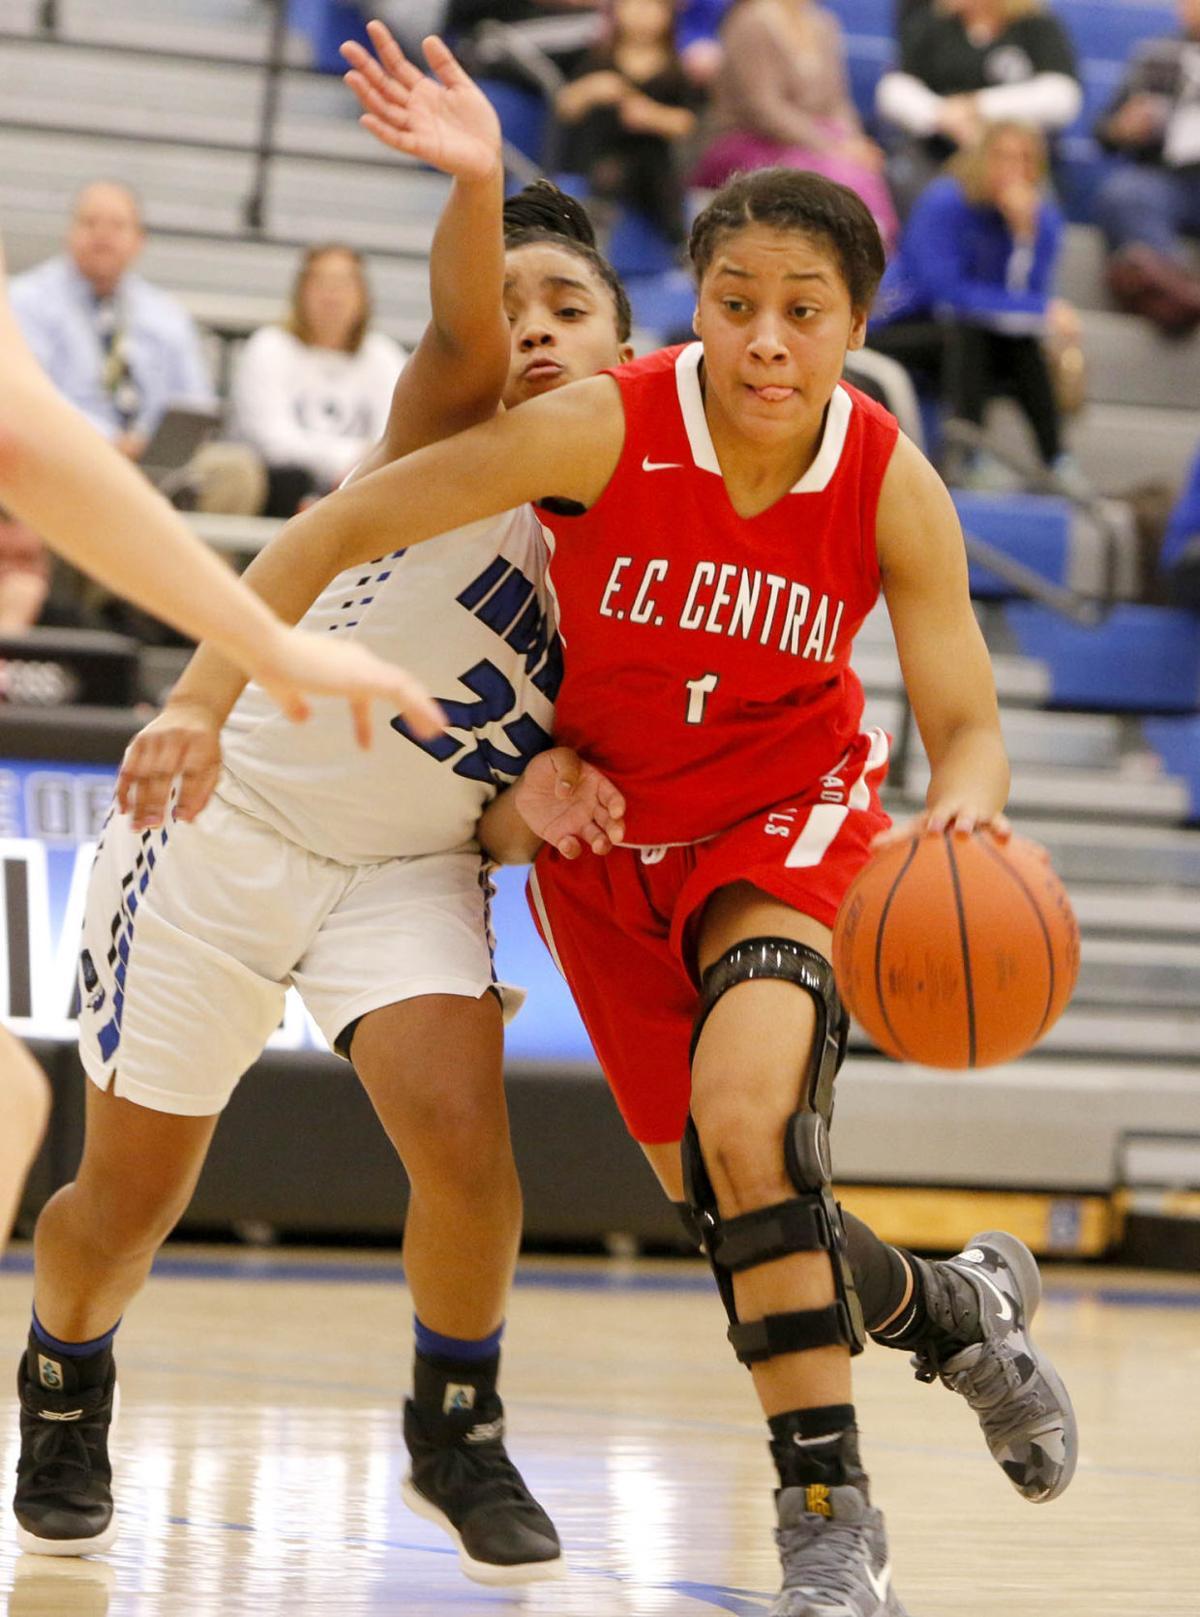 E.C. Central at Lake Central girls basketball